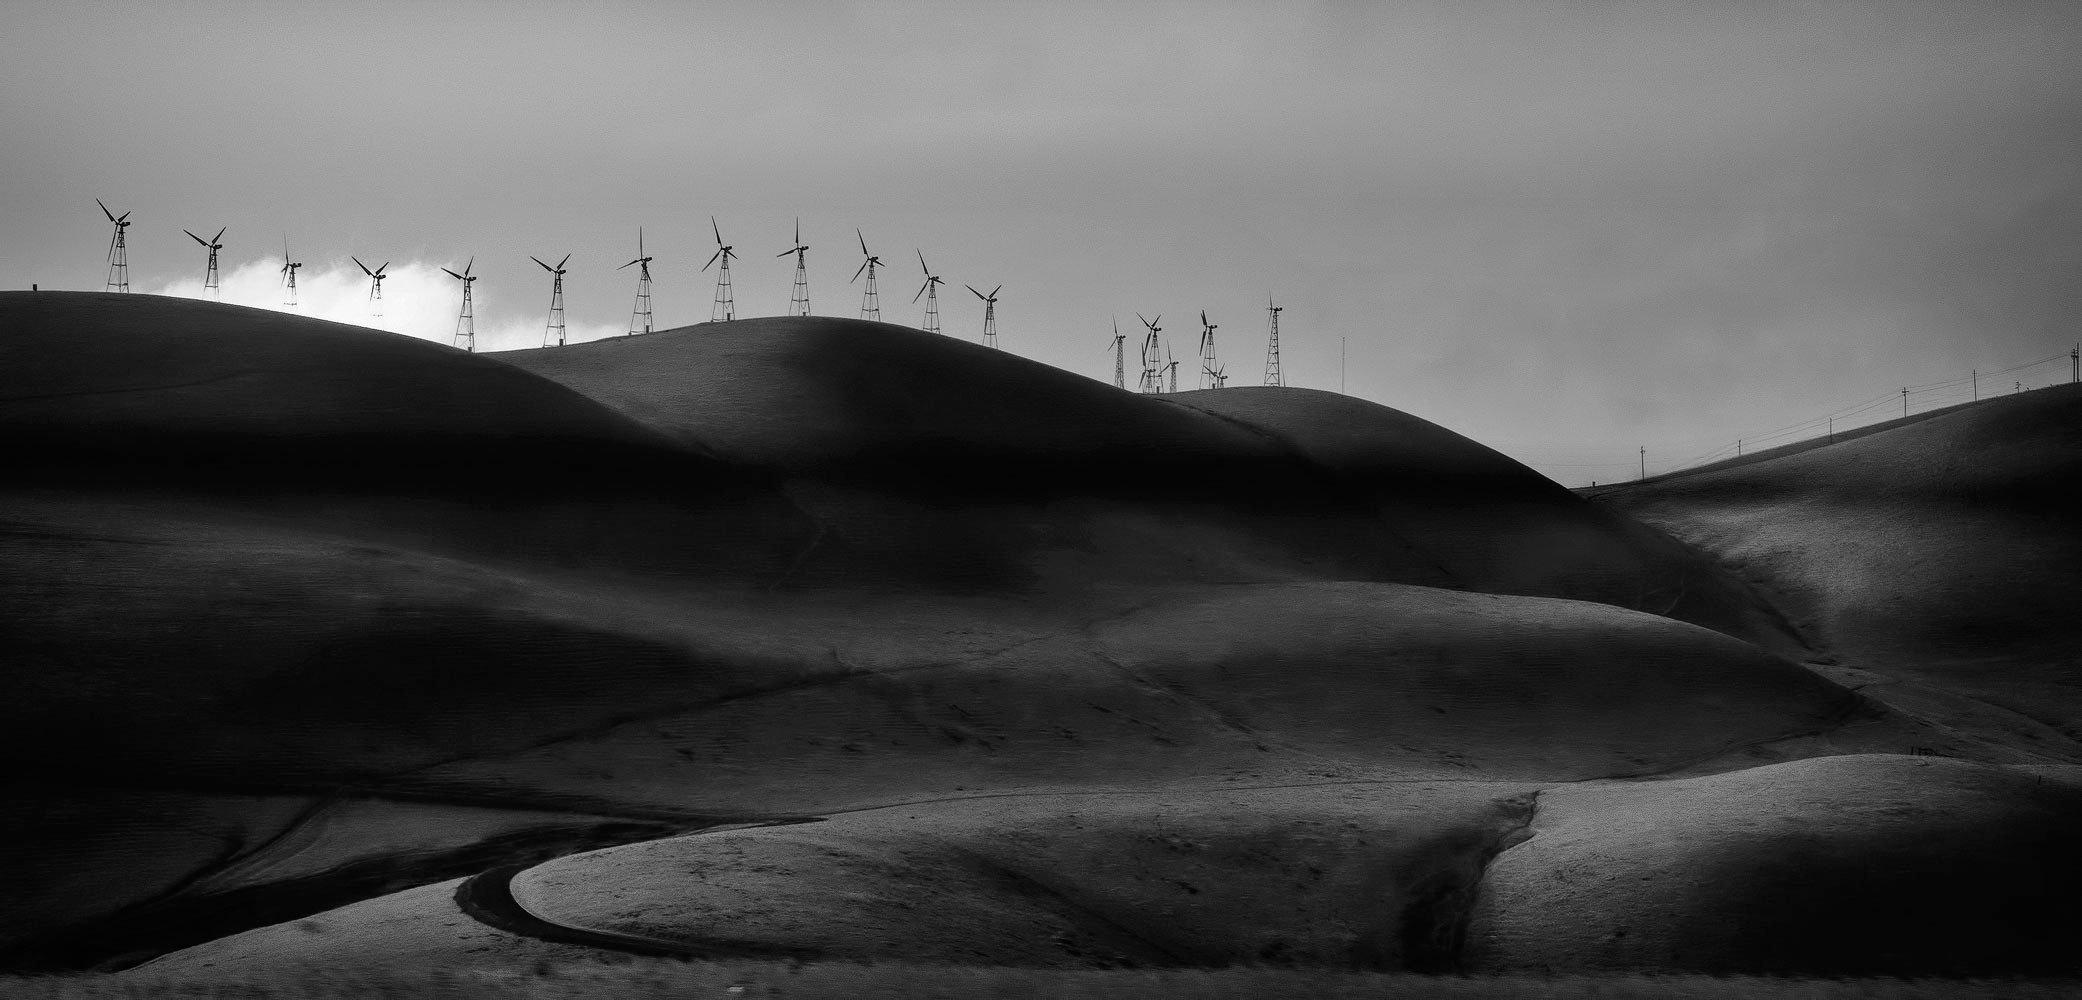 Black and white, Landscape, Sutkus Rolandas